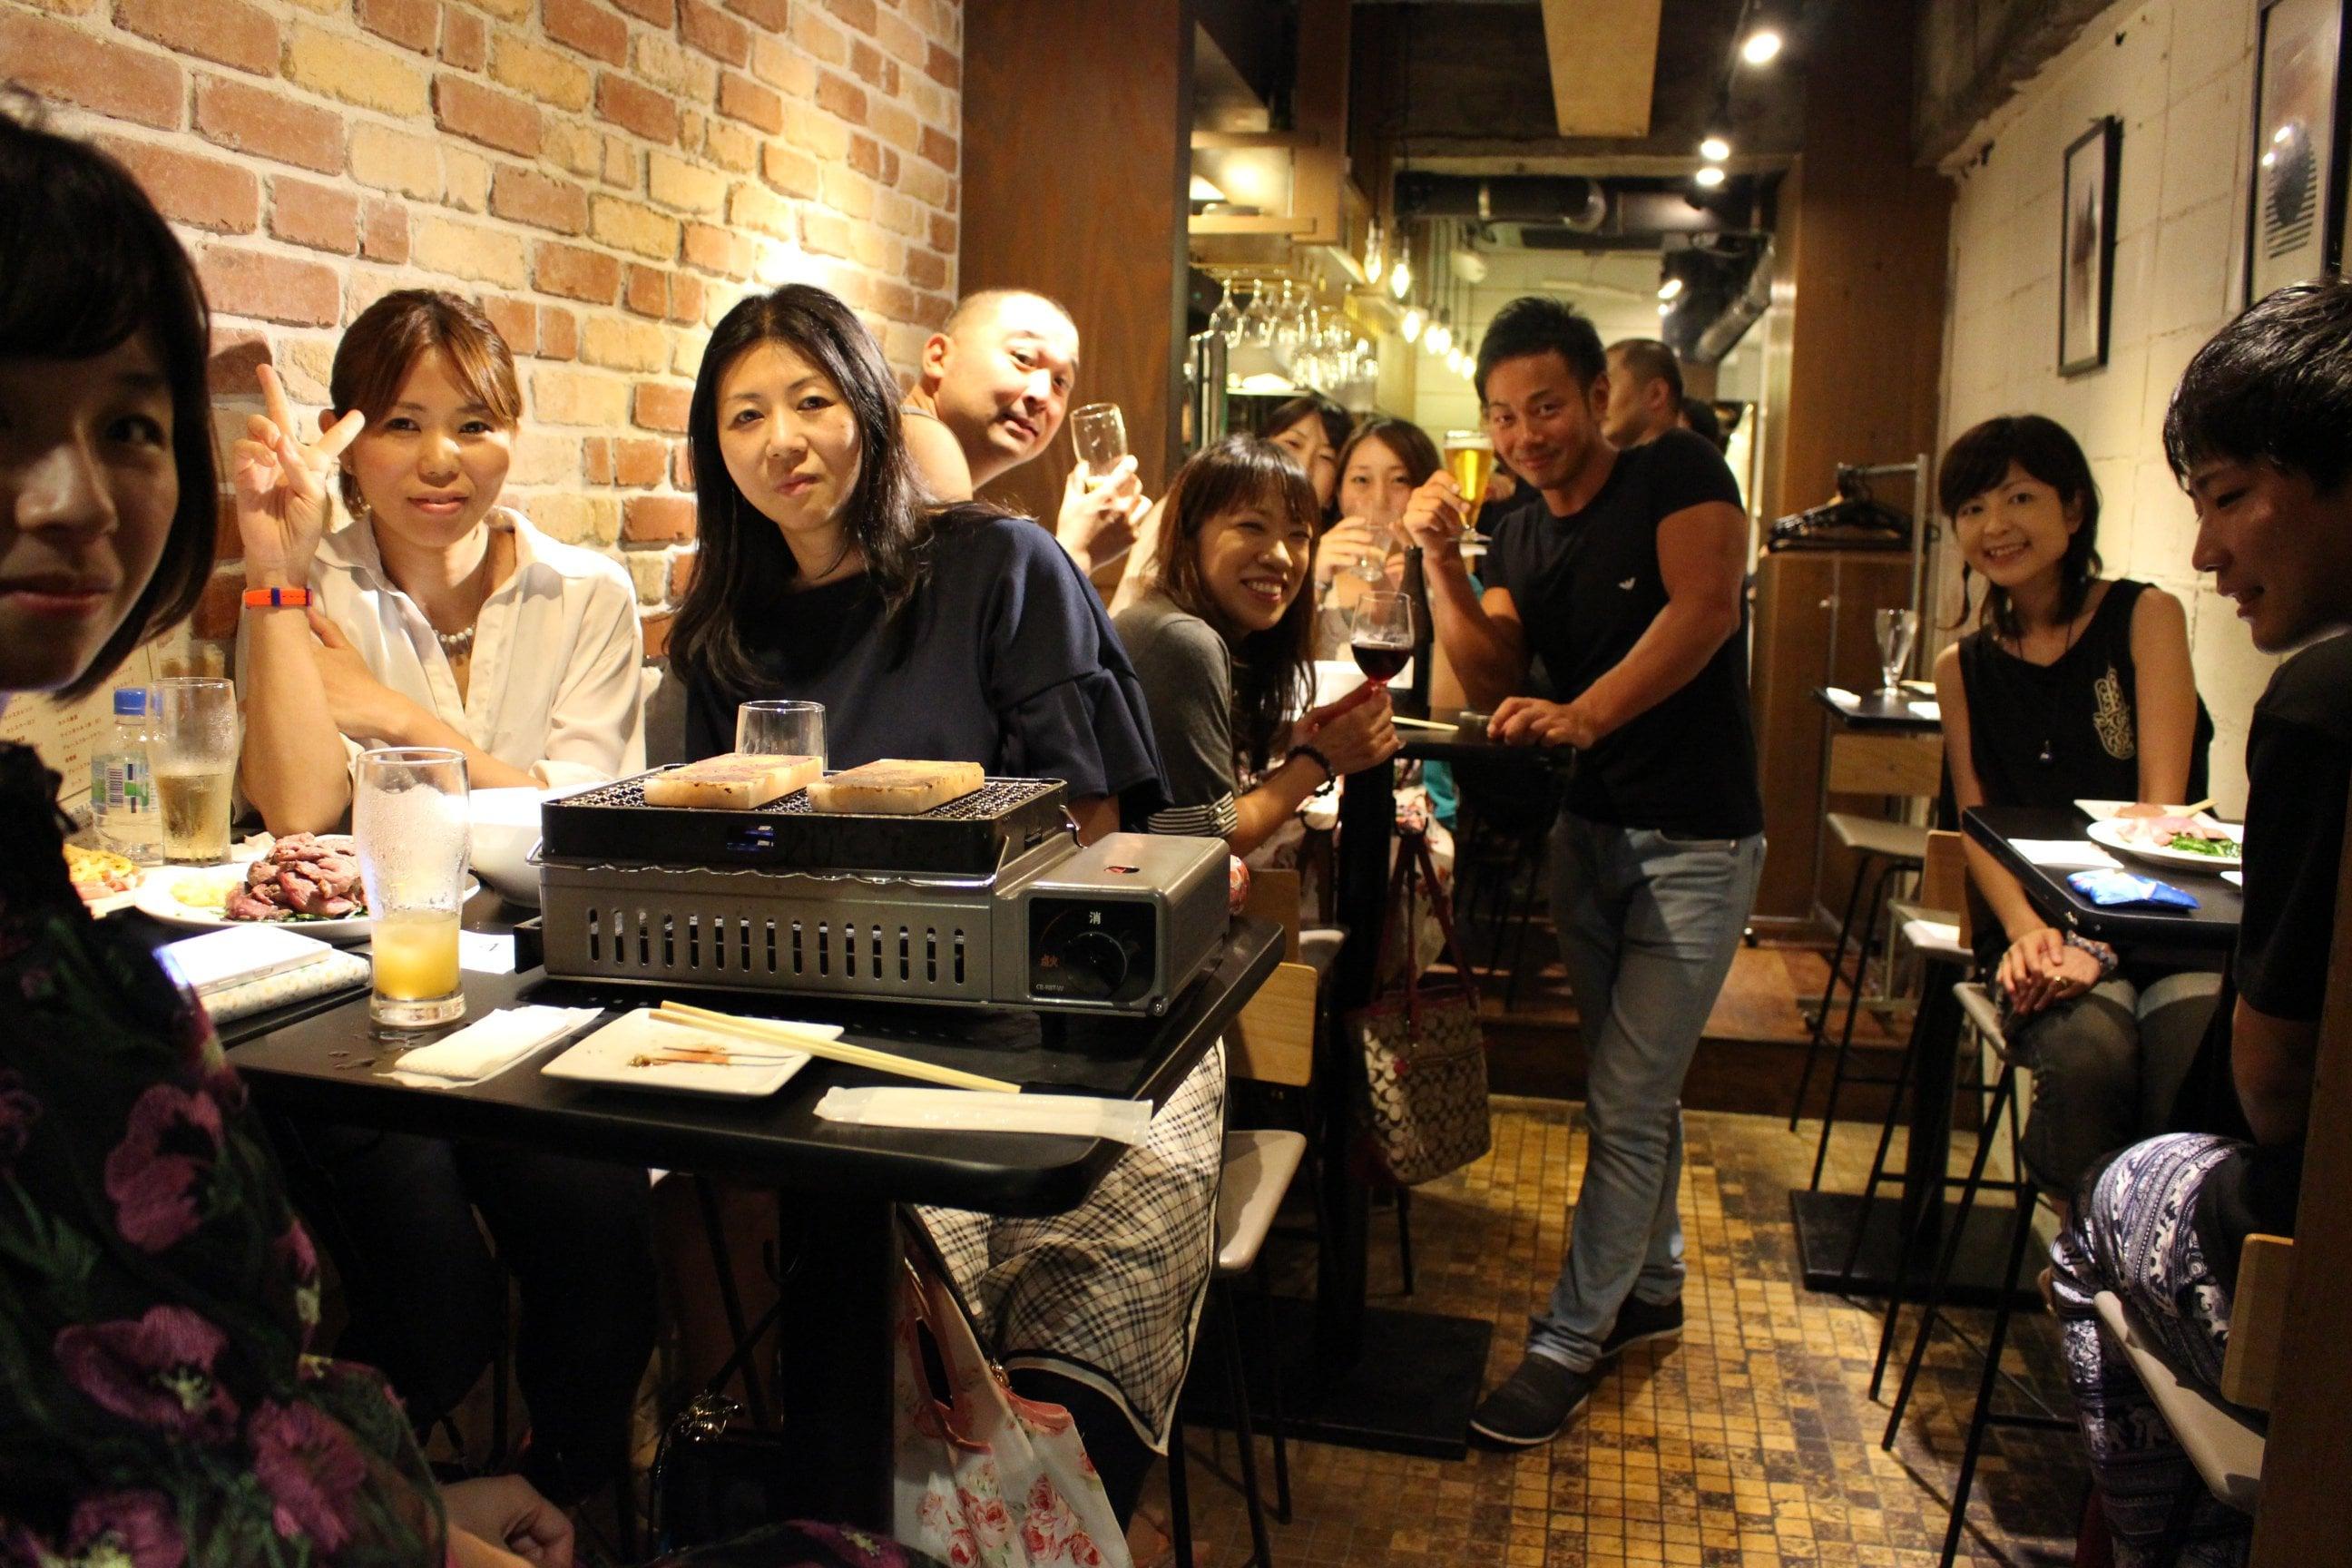 [FC会員様専用]限定20席!ドラゴンゲートディナーイベント・土井吉 in 肉のヒマラヤTEPPAN 赤坂(第一部18時スタート)のイメージその2